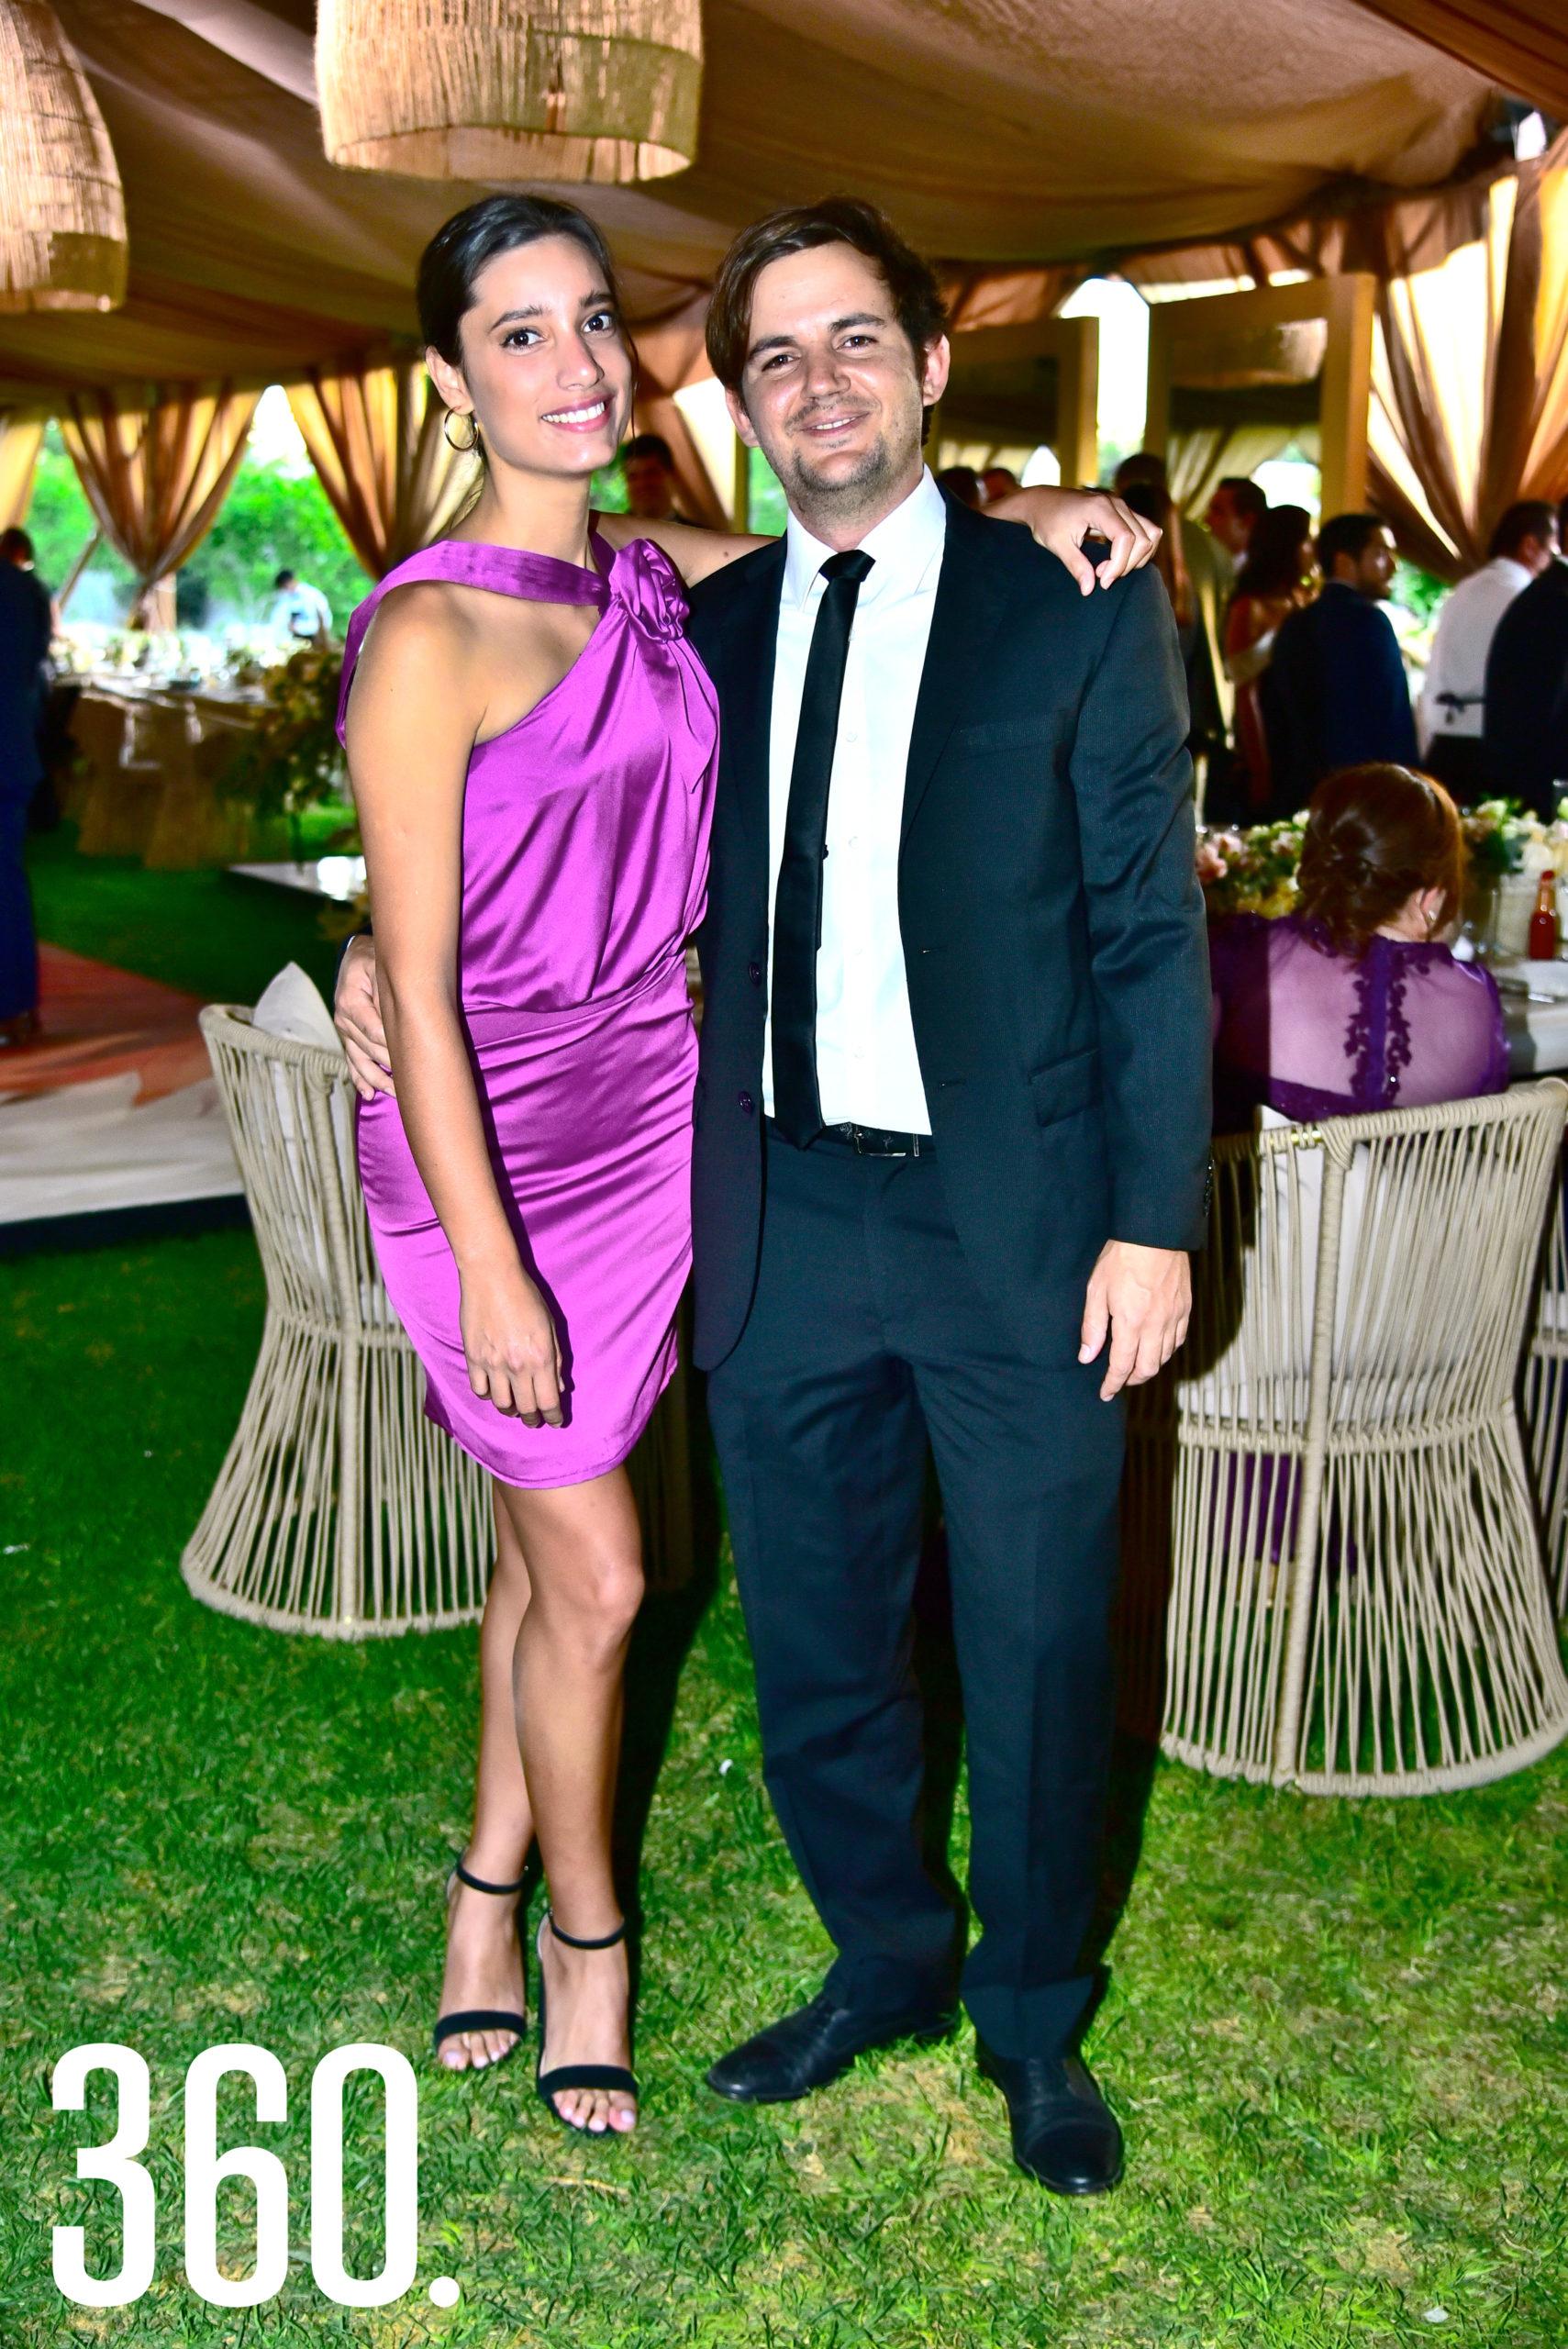 Fernanda Acosta y Esteban Arizpe.